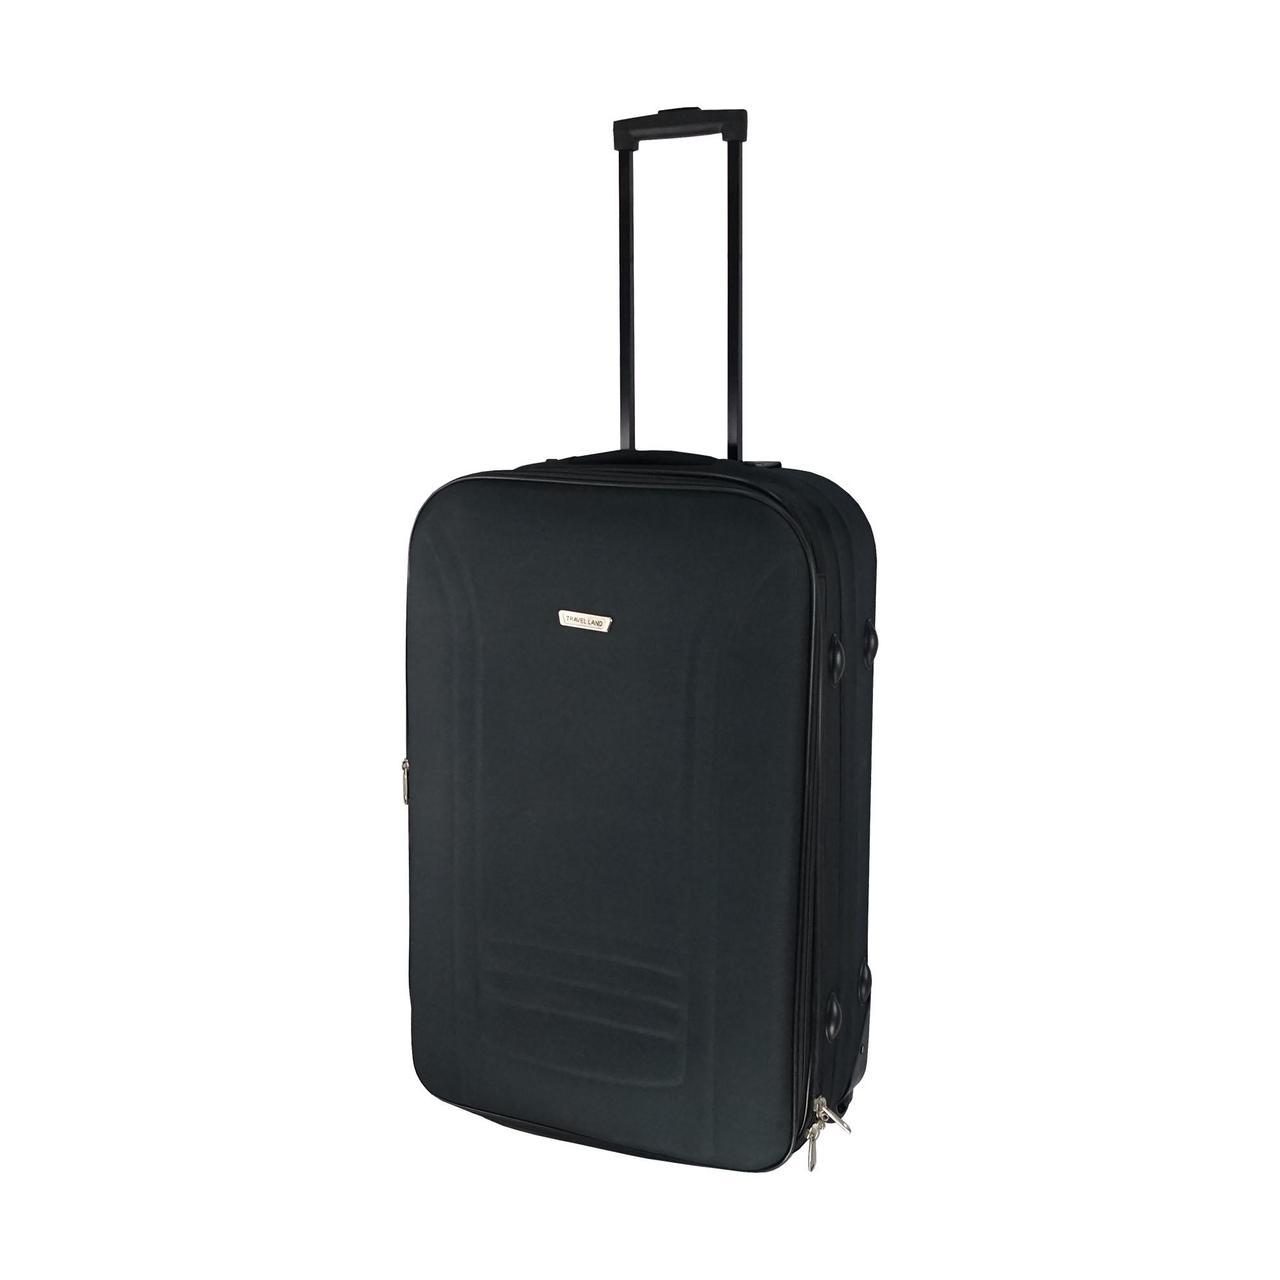 2a9bcd28bcee Чемодан на колесиках Travel Land (68*42 см.) - чемодан среднего размера